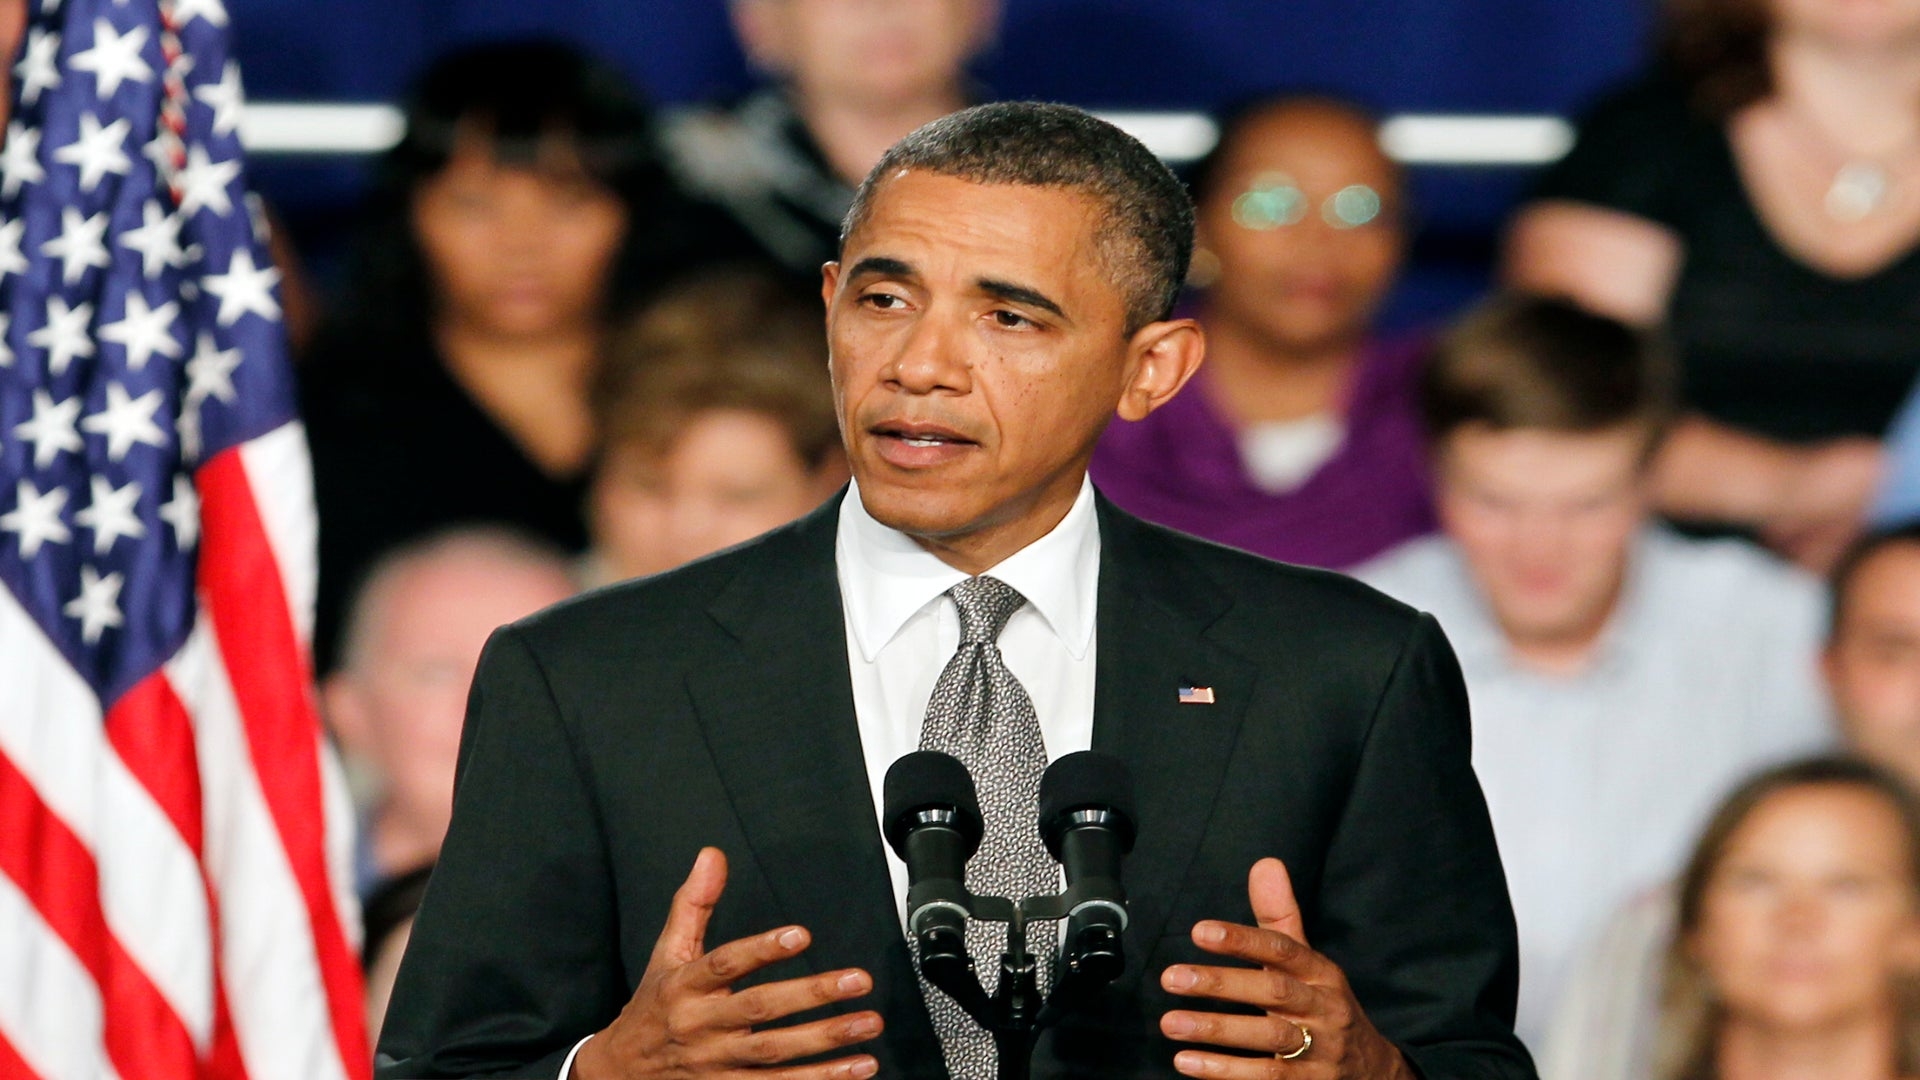 President Obama Issues Statement on 'Dark Knight Rises' Massacre